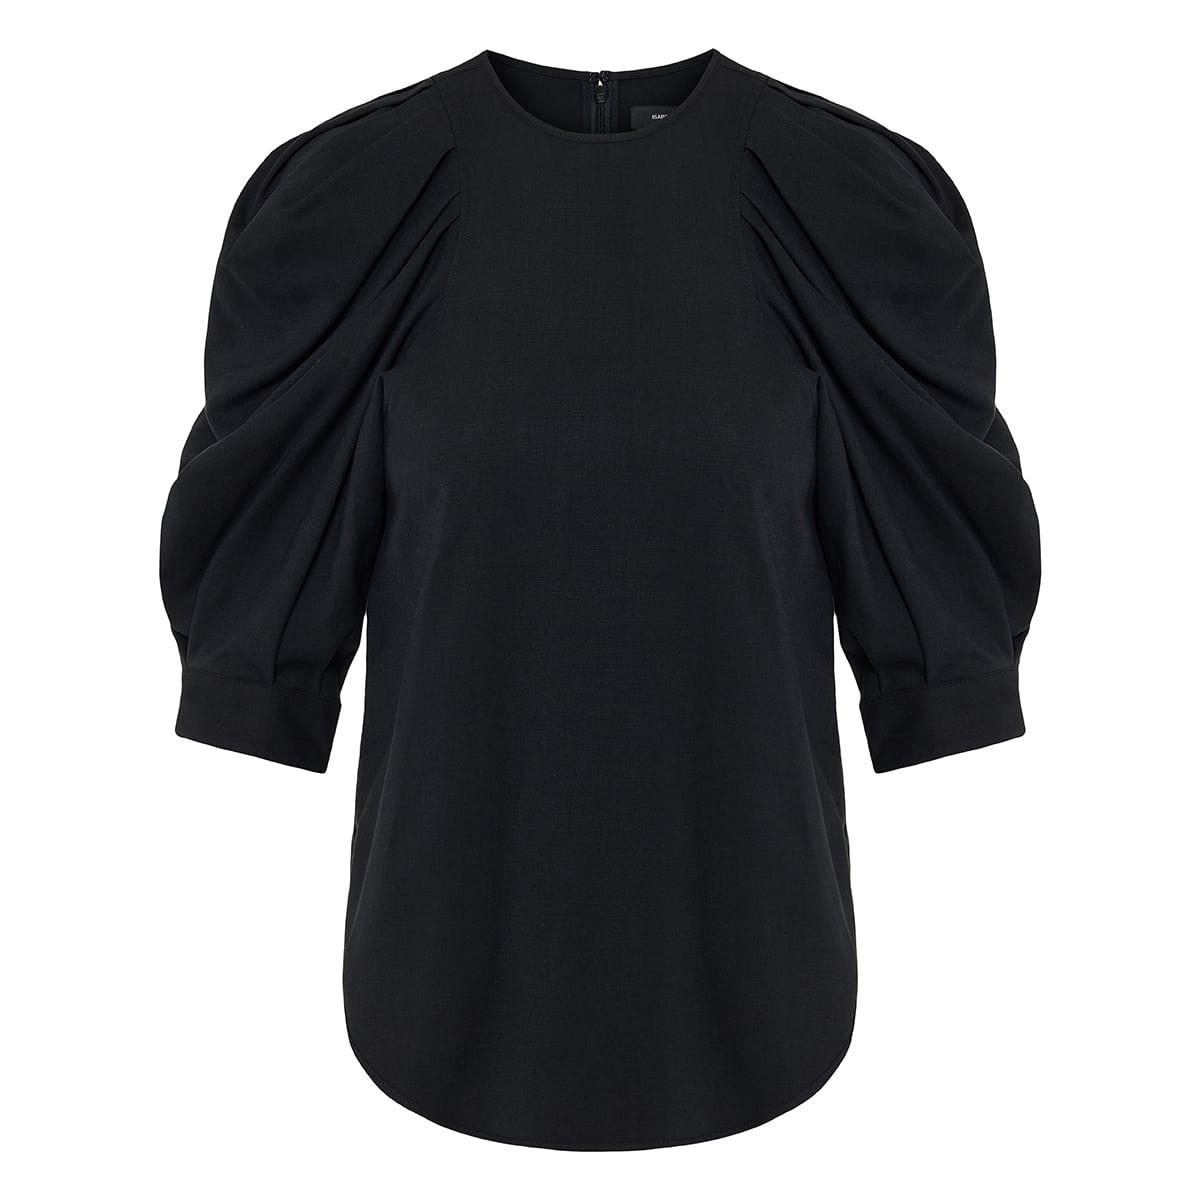 Surya puff-sleeved blouse